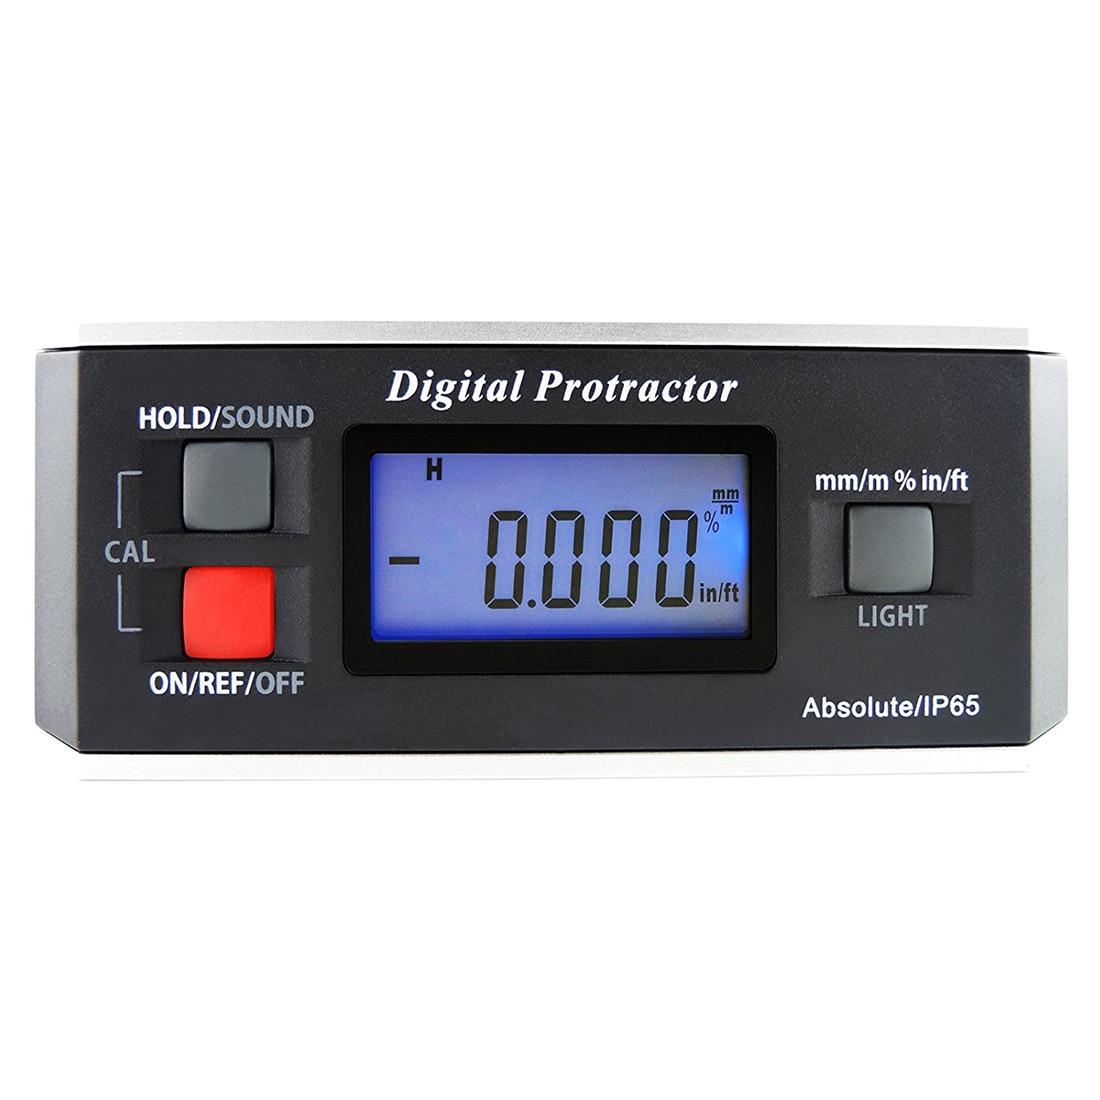 Mini Digital Inclinometer,360 degree  Mini Digital Protractor Inclinometer Angle Meter with Base digital protractor inclinometer angle meter digital bevel box 4 x 90 degree range magnetic base